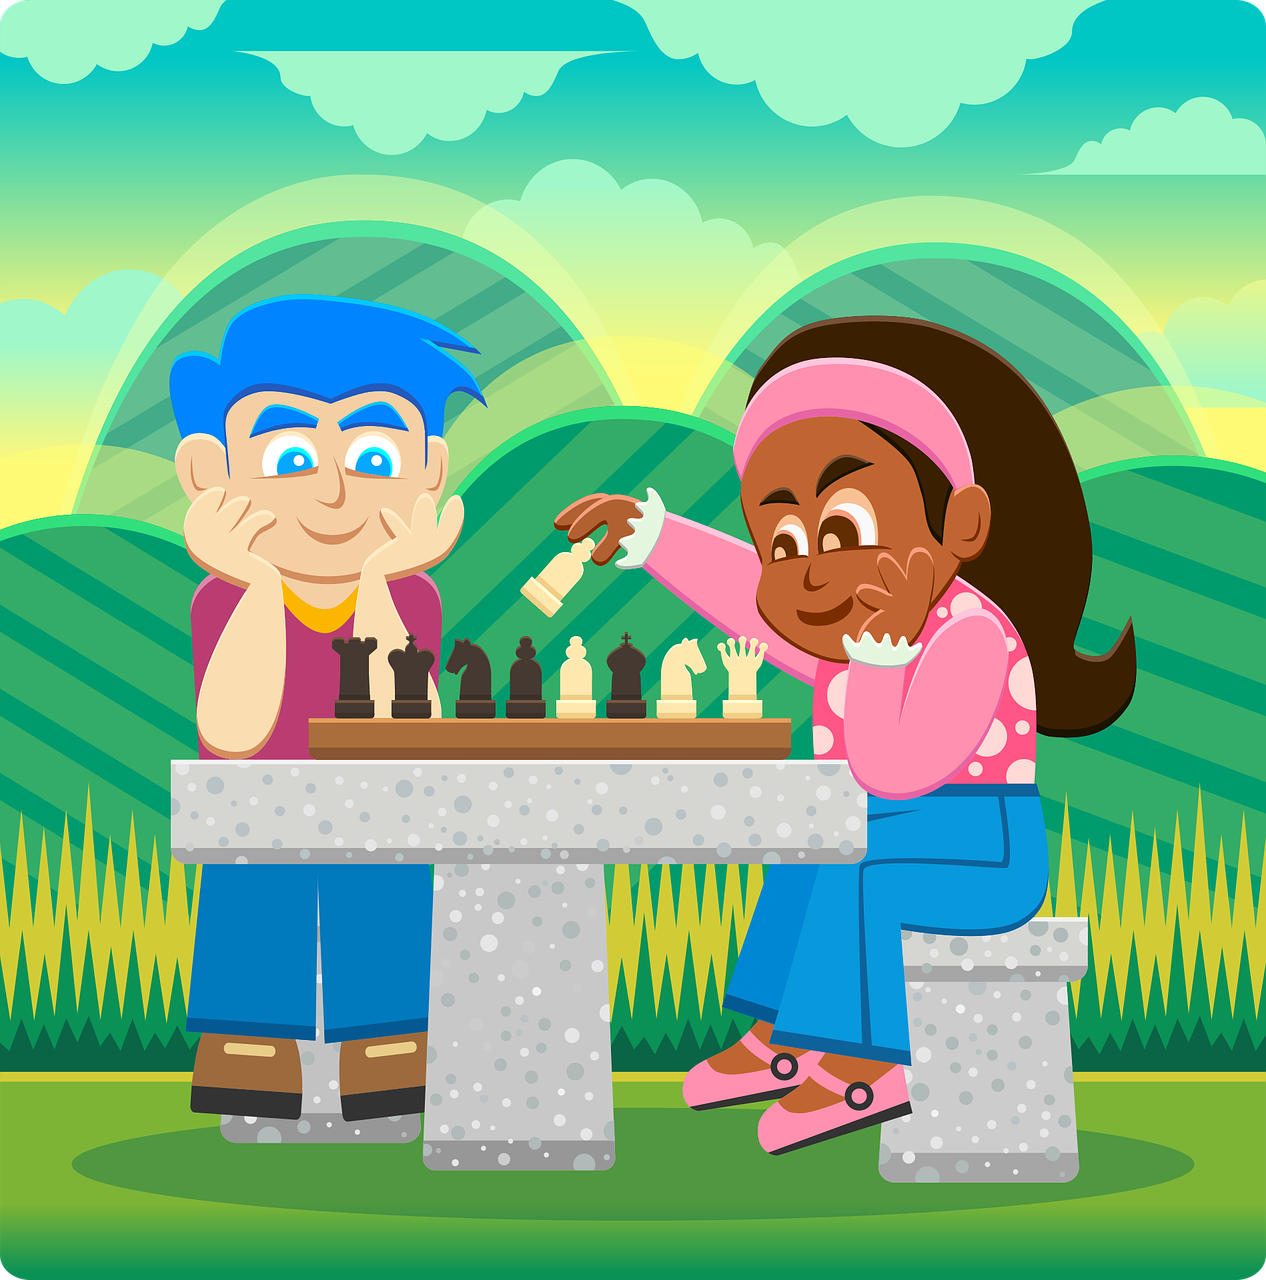 Illustration of children playing chess.